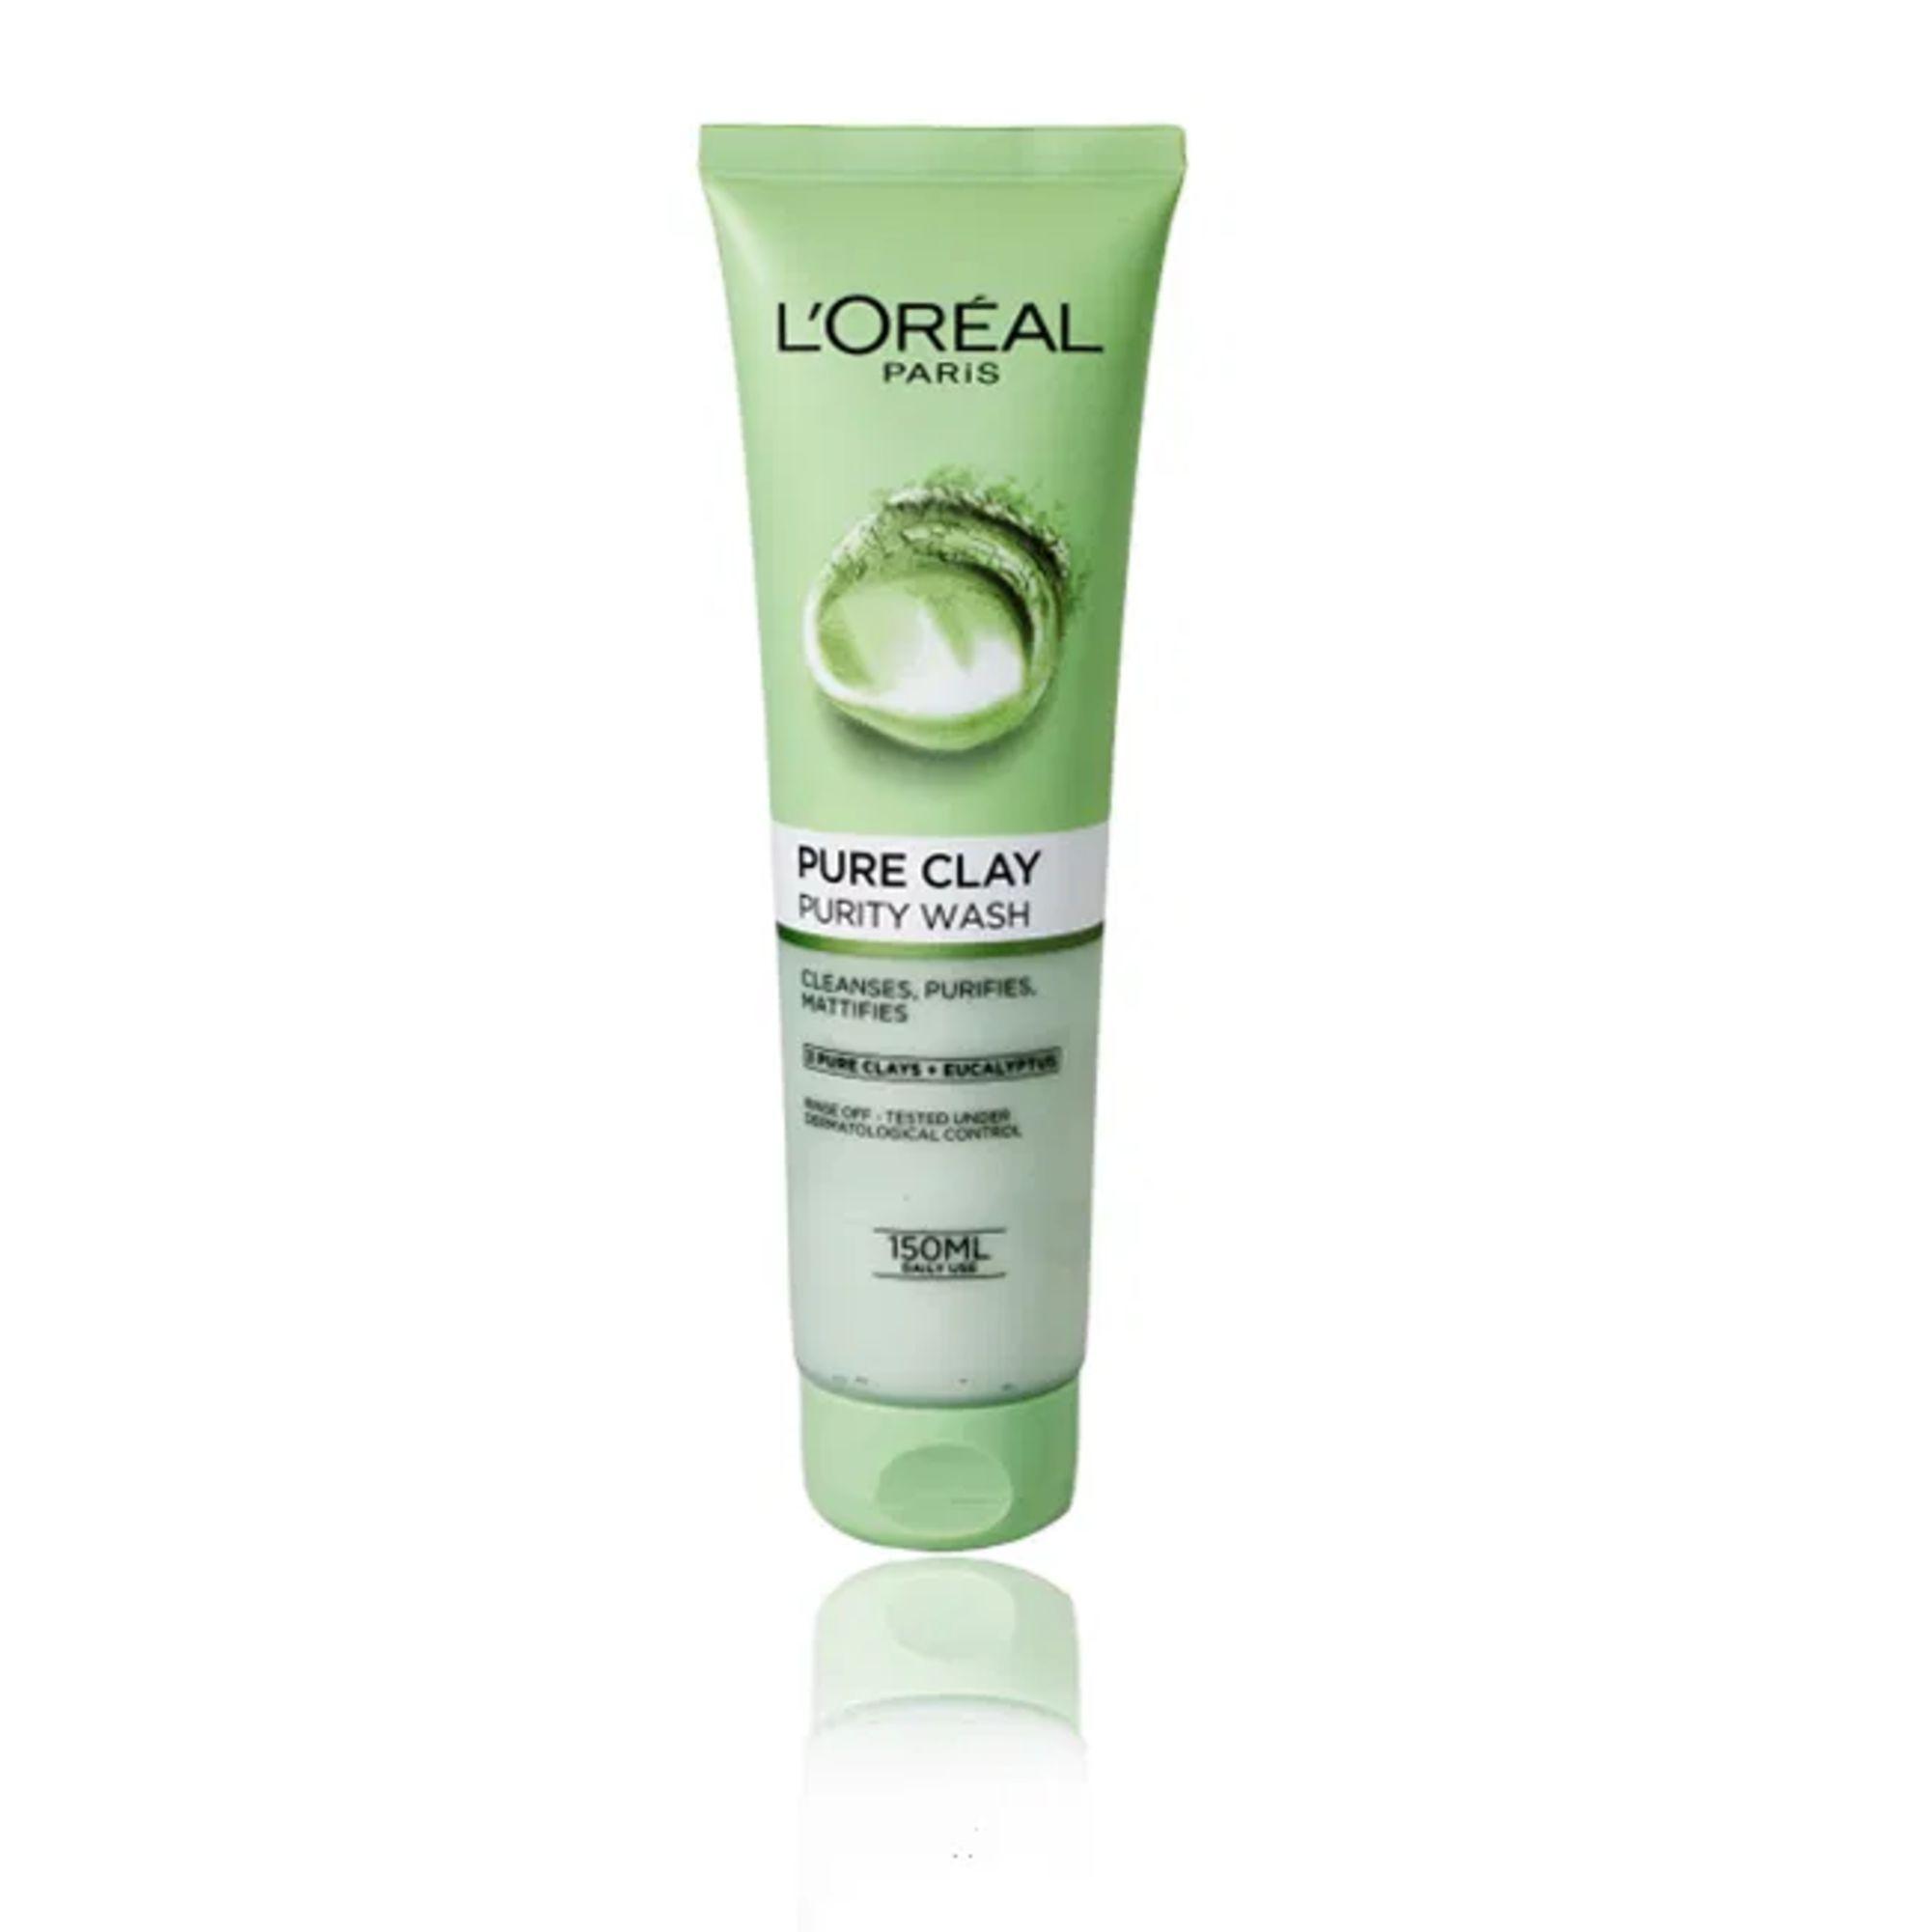 Loreal Pure Clay Purity Wash 150ml